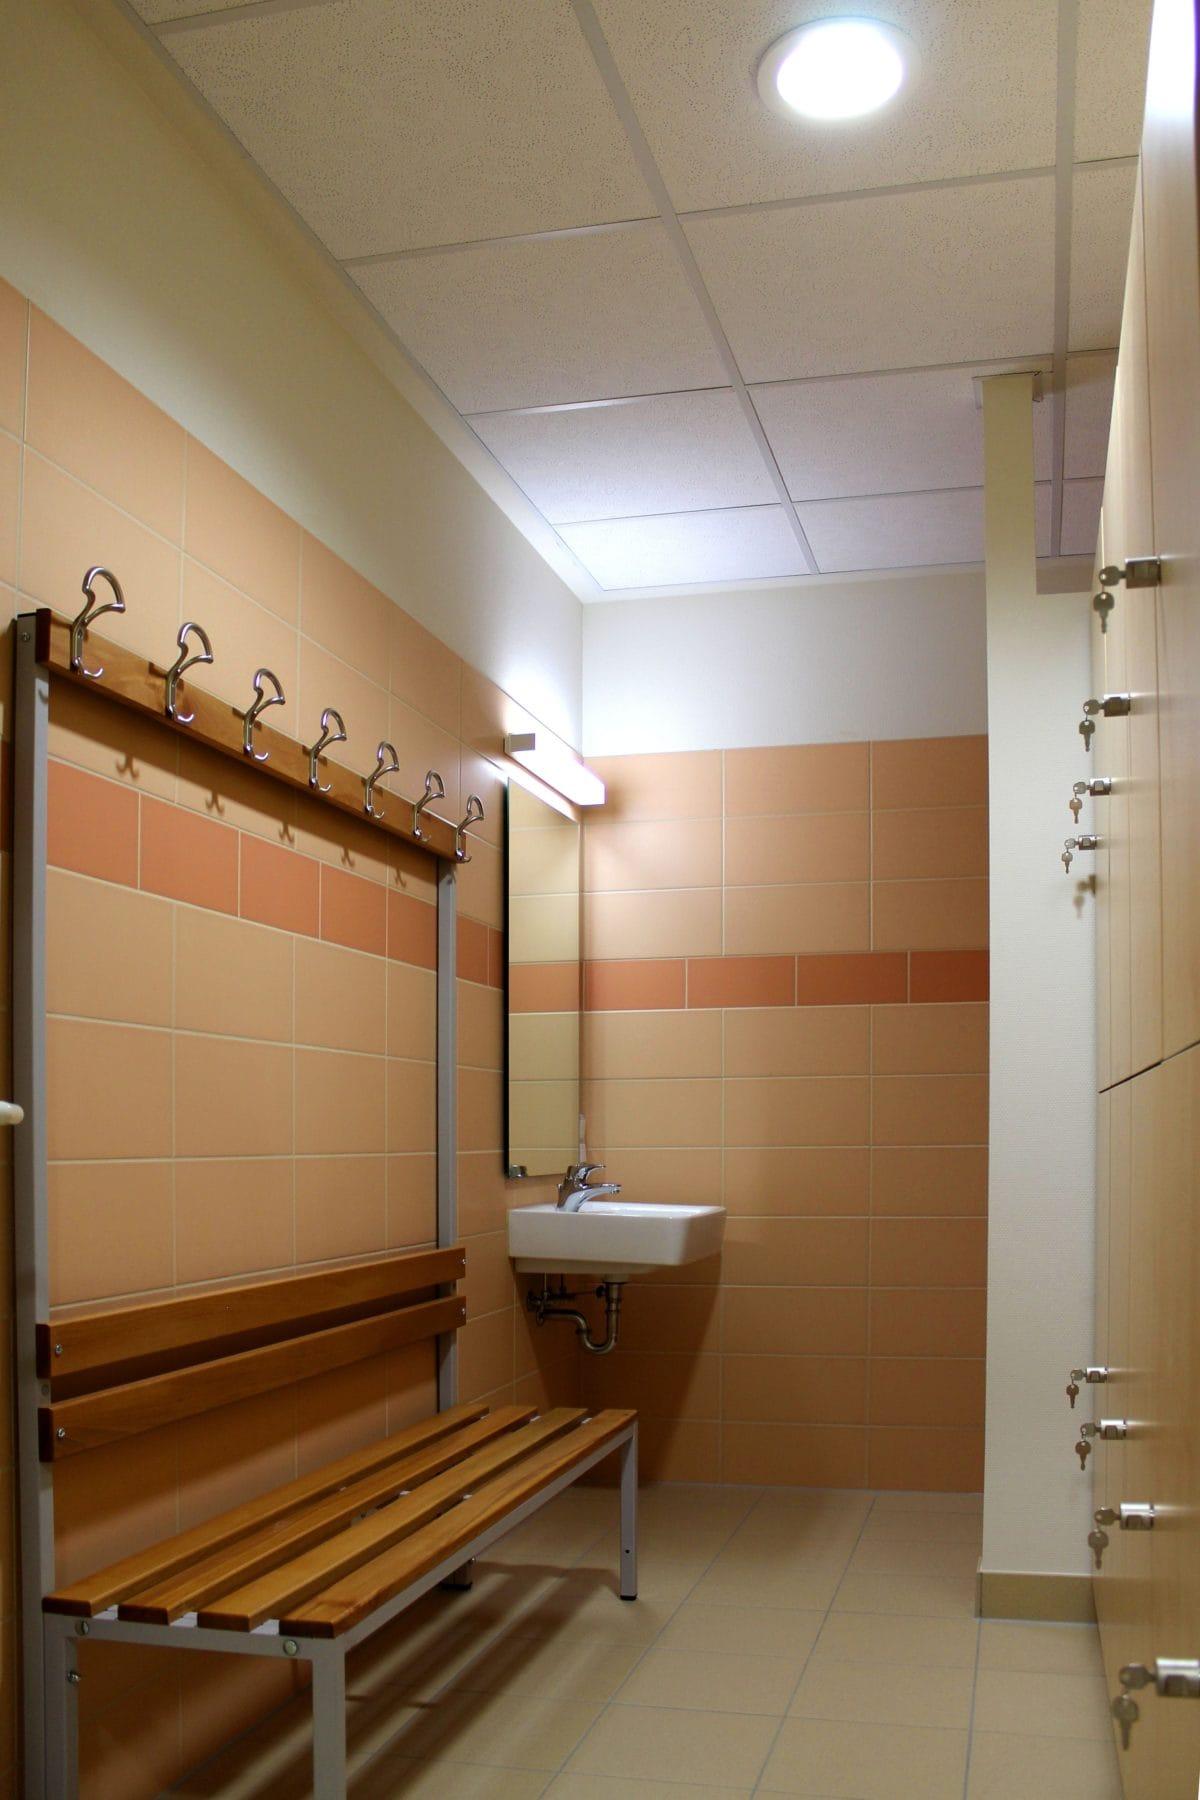 Neubau Tagespflege in modularer Bauweise, zertifiziertes Passivhaus | Umkleide